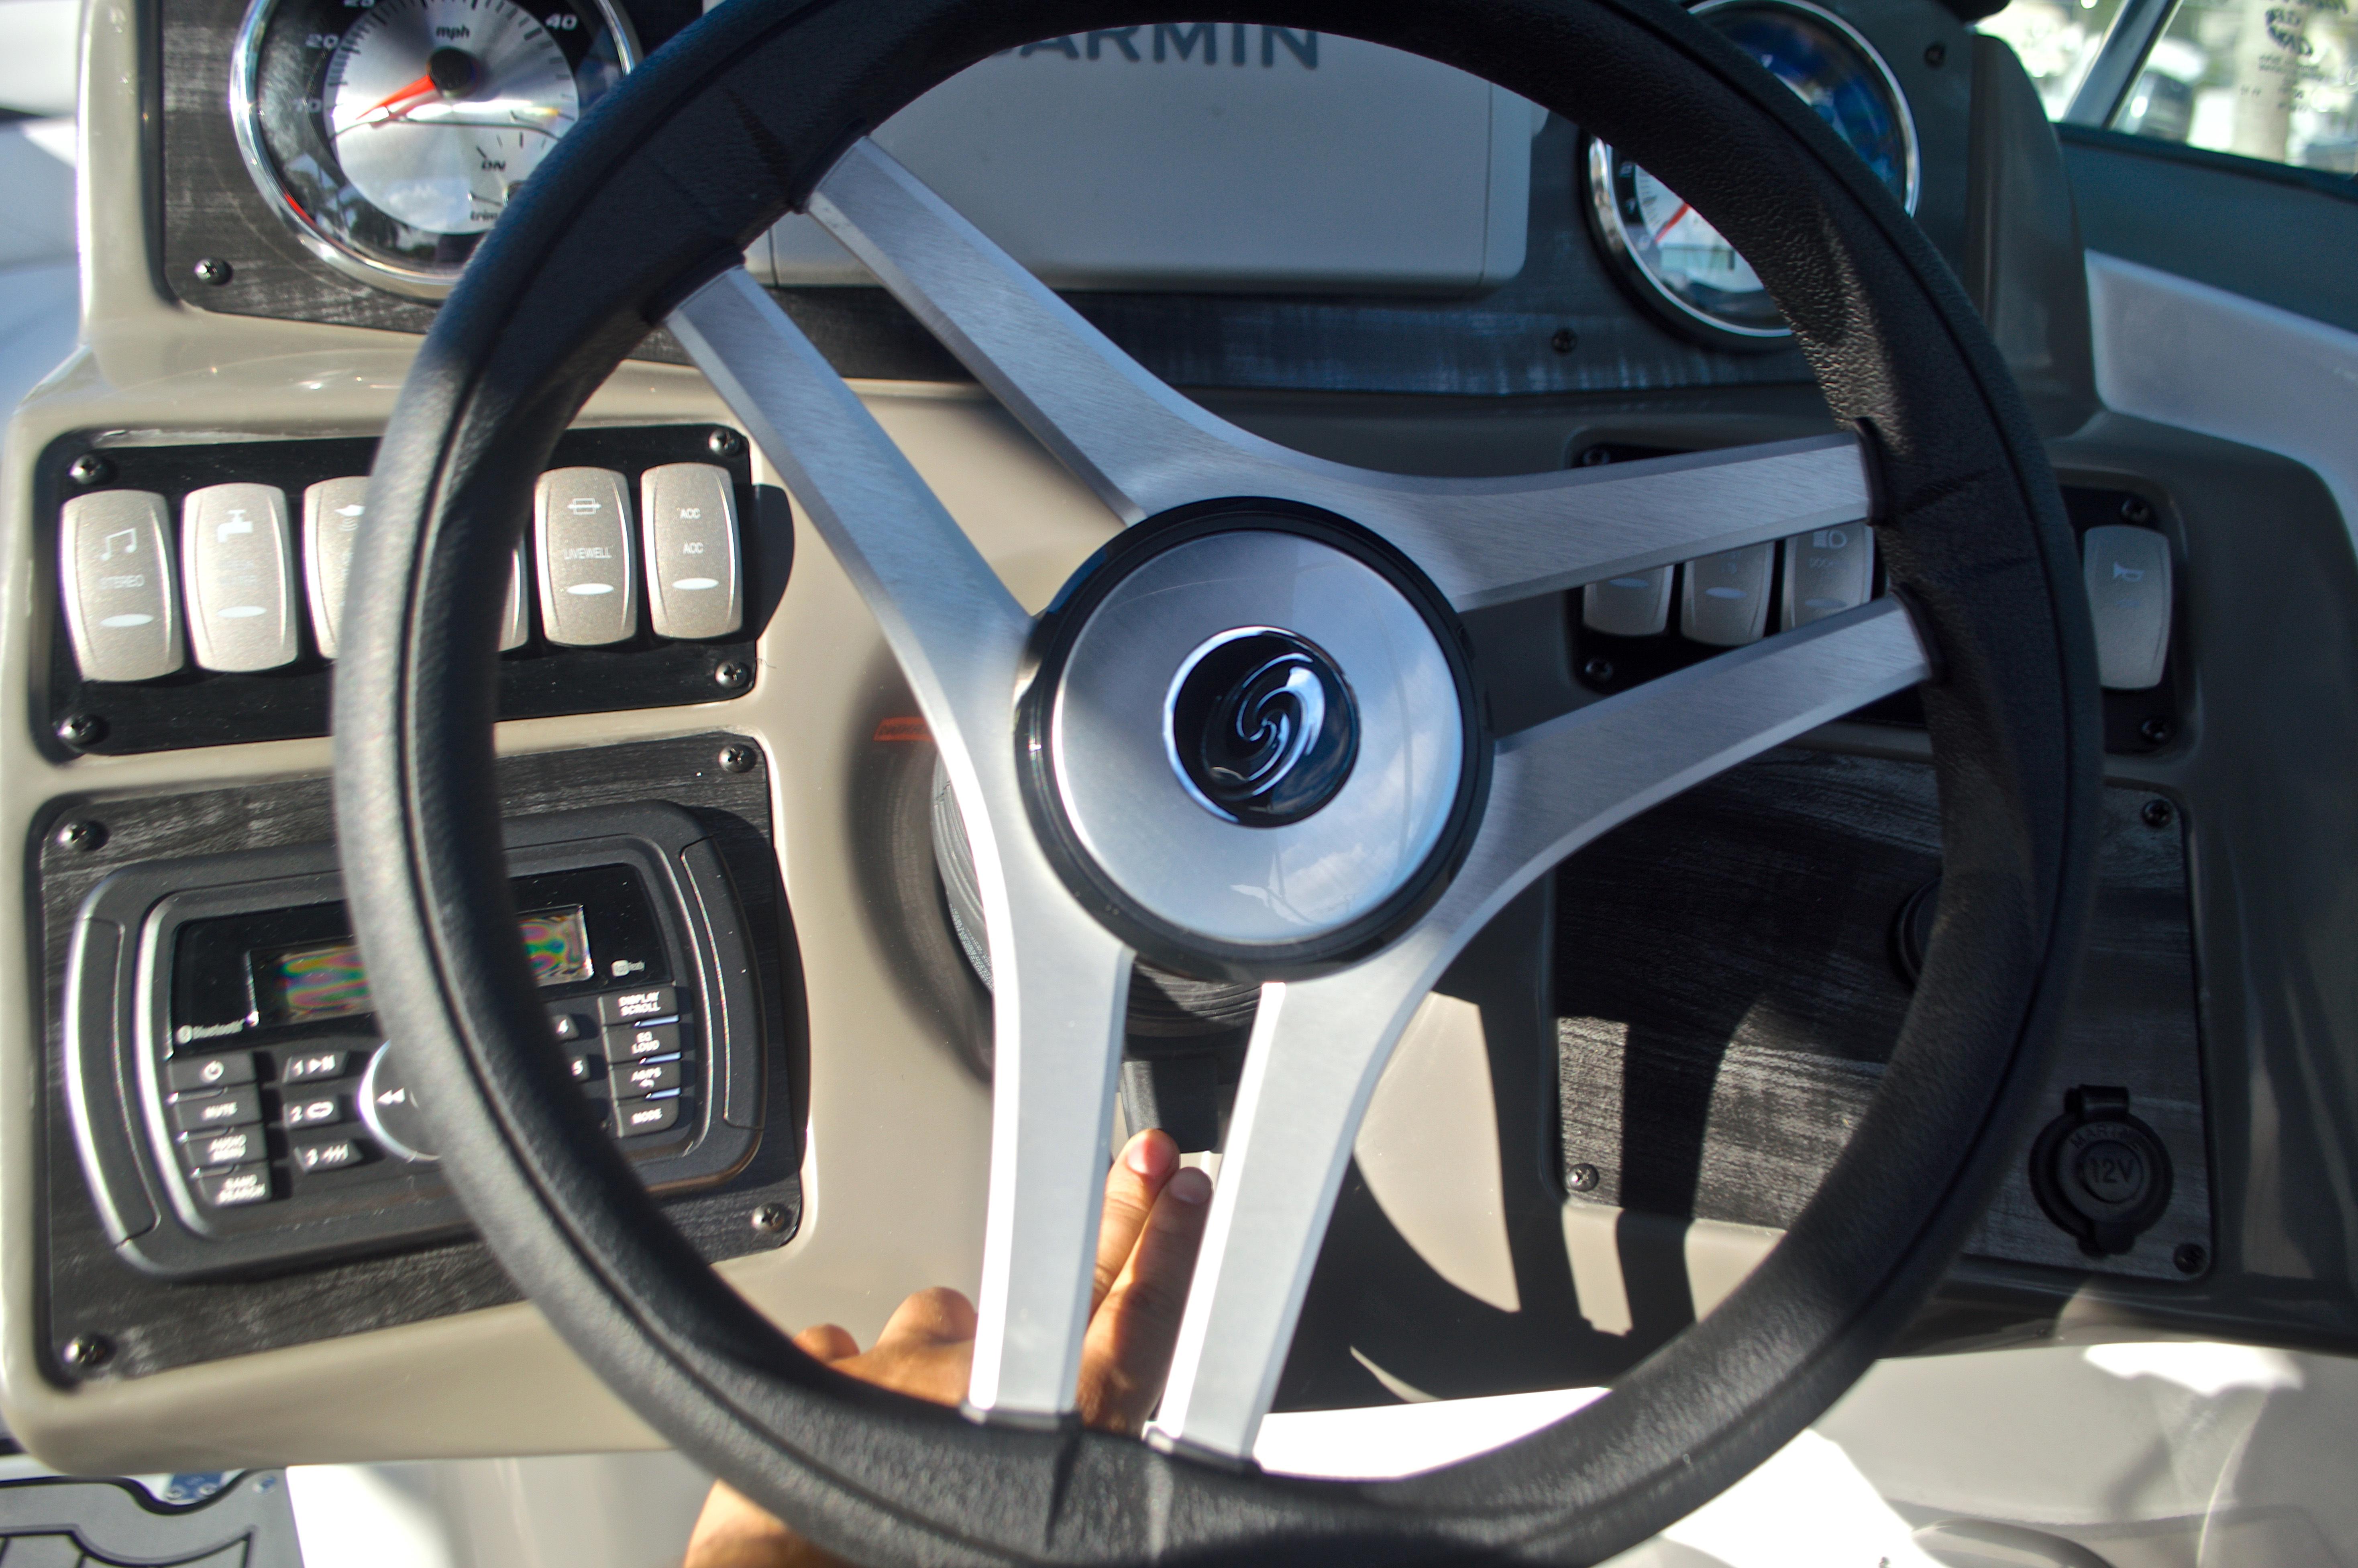 Thumbnail 47 for New 2017 Hurricane SunDeck SD 2400 OB boat for sale in Miami, FL